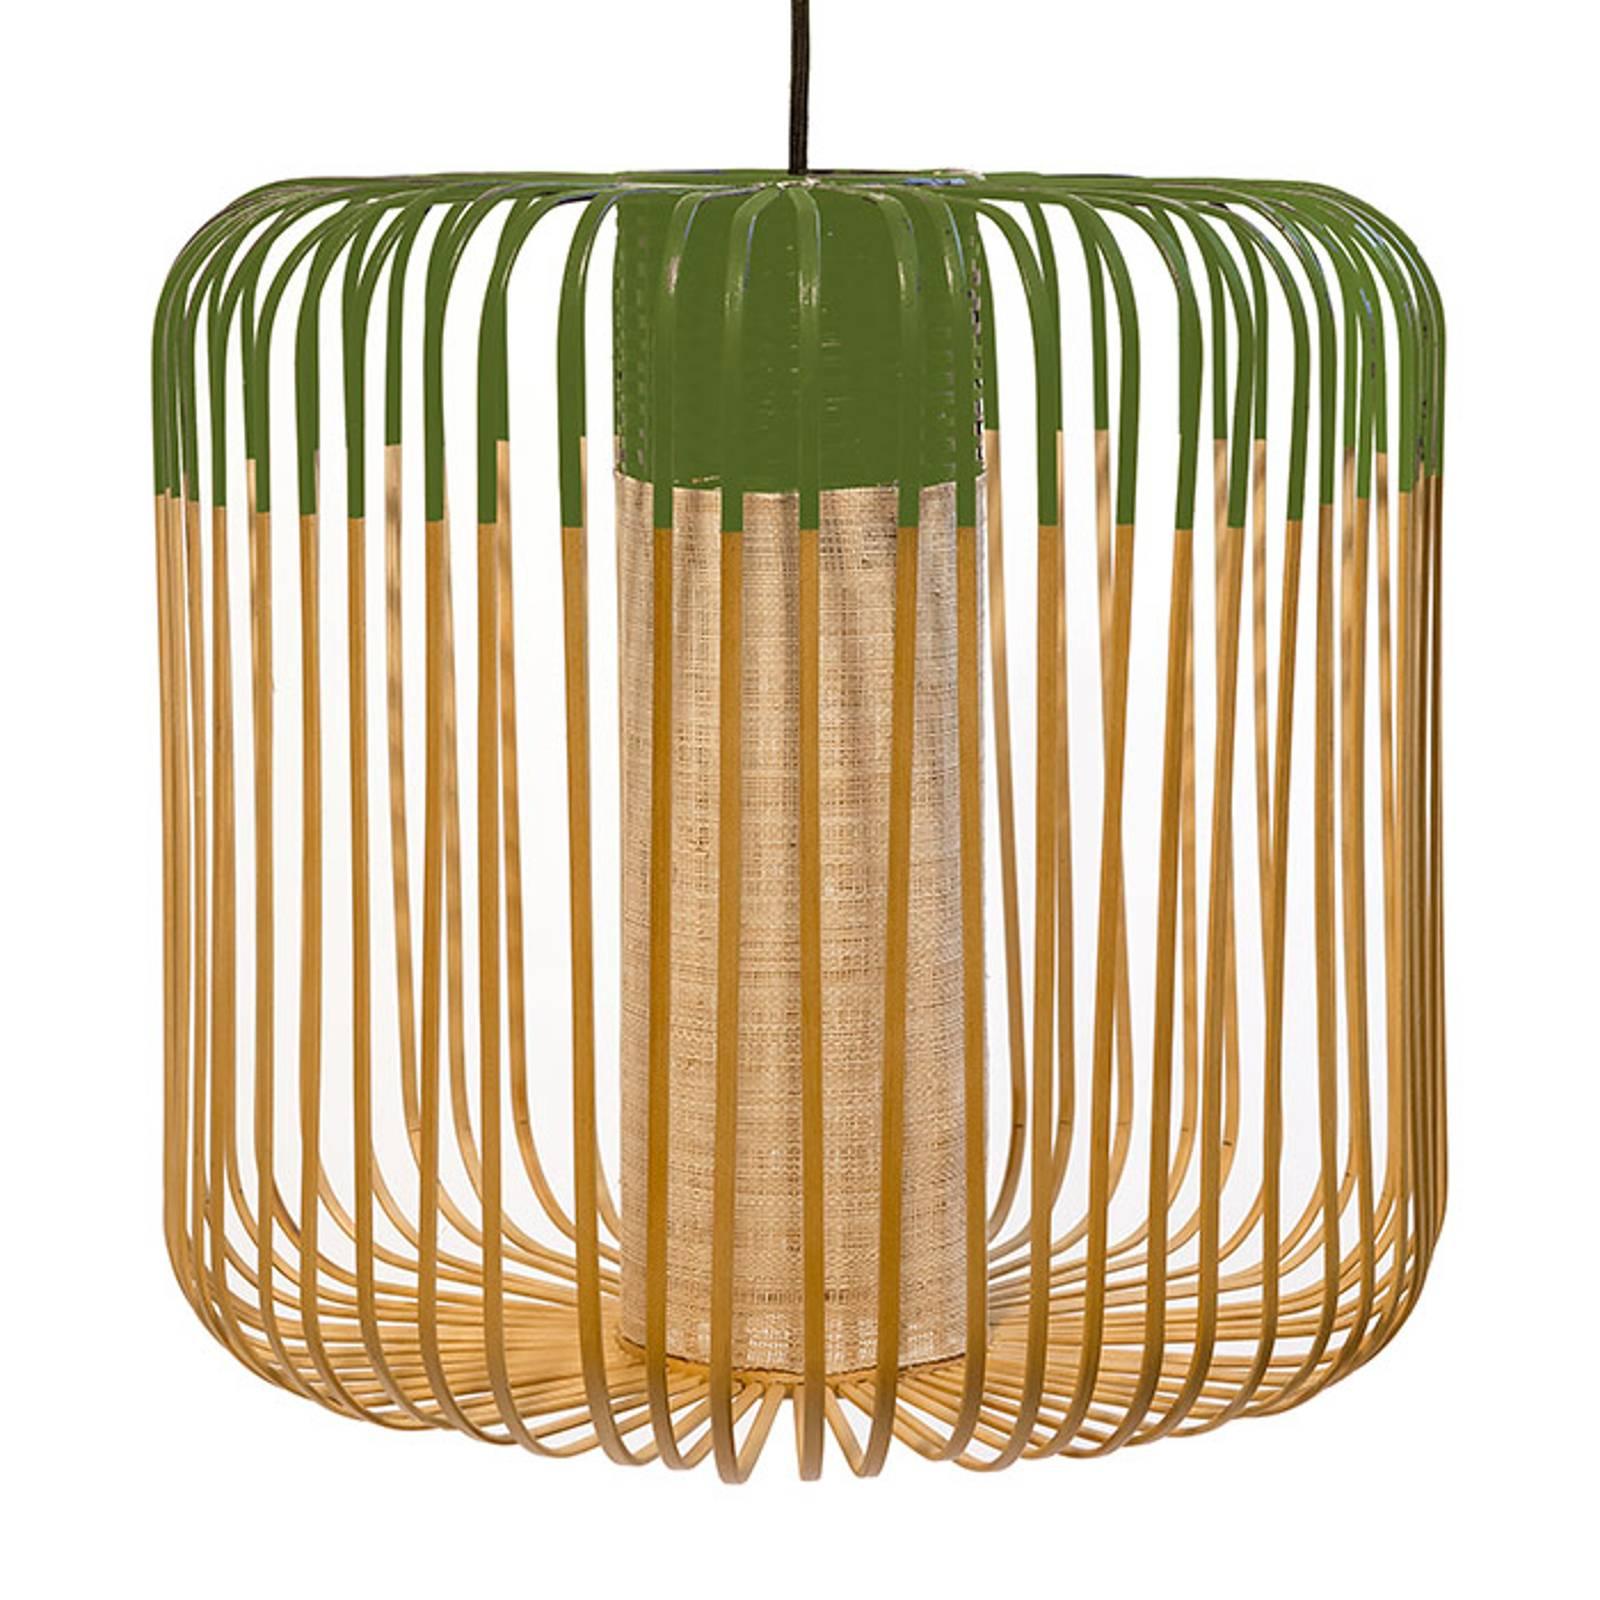 Forestier Bamboo Light M lampa wisząca zielona